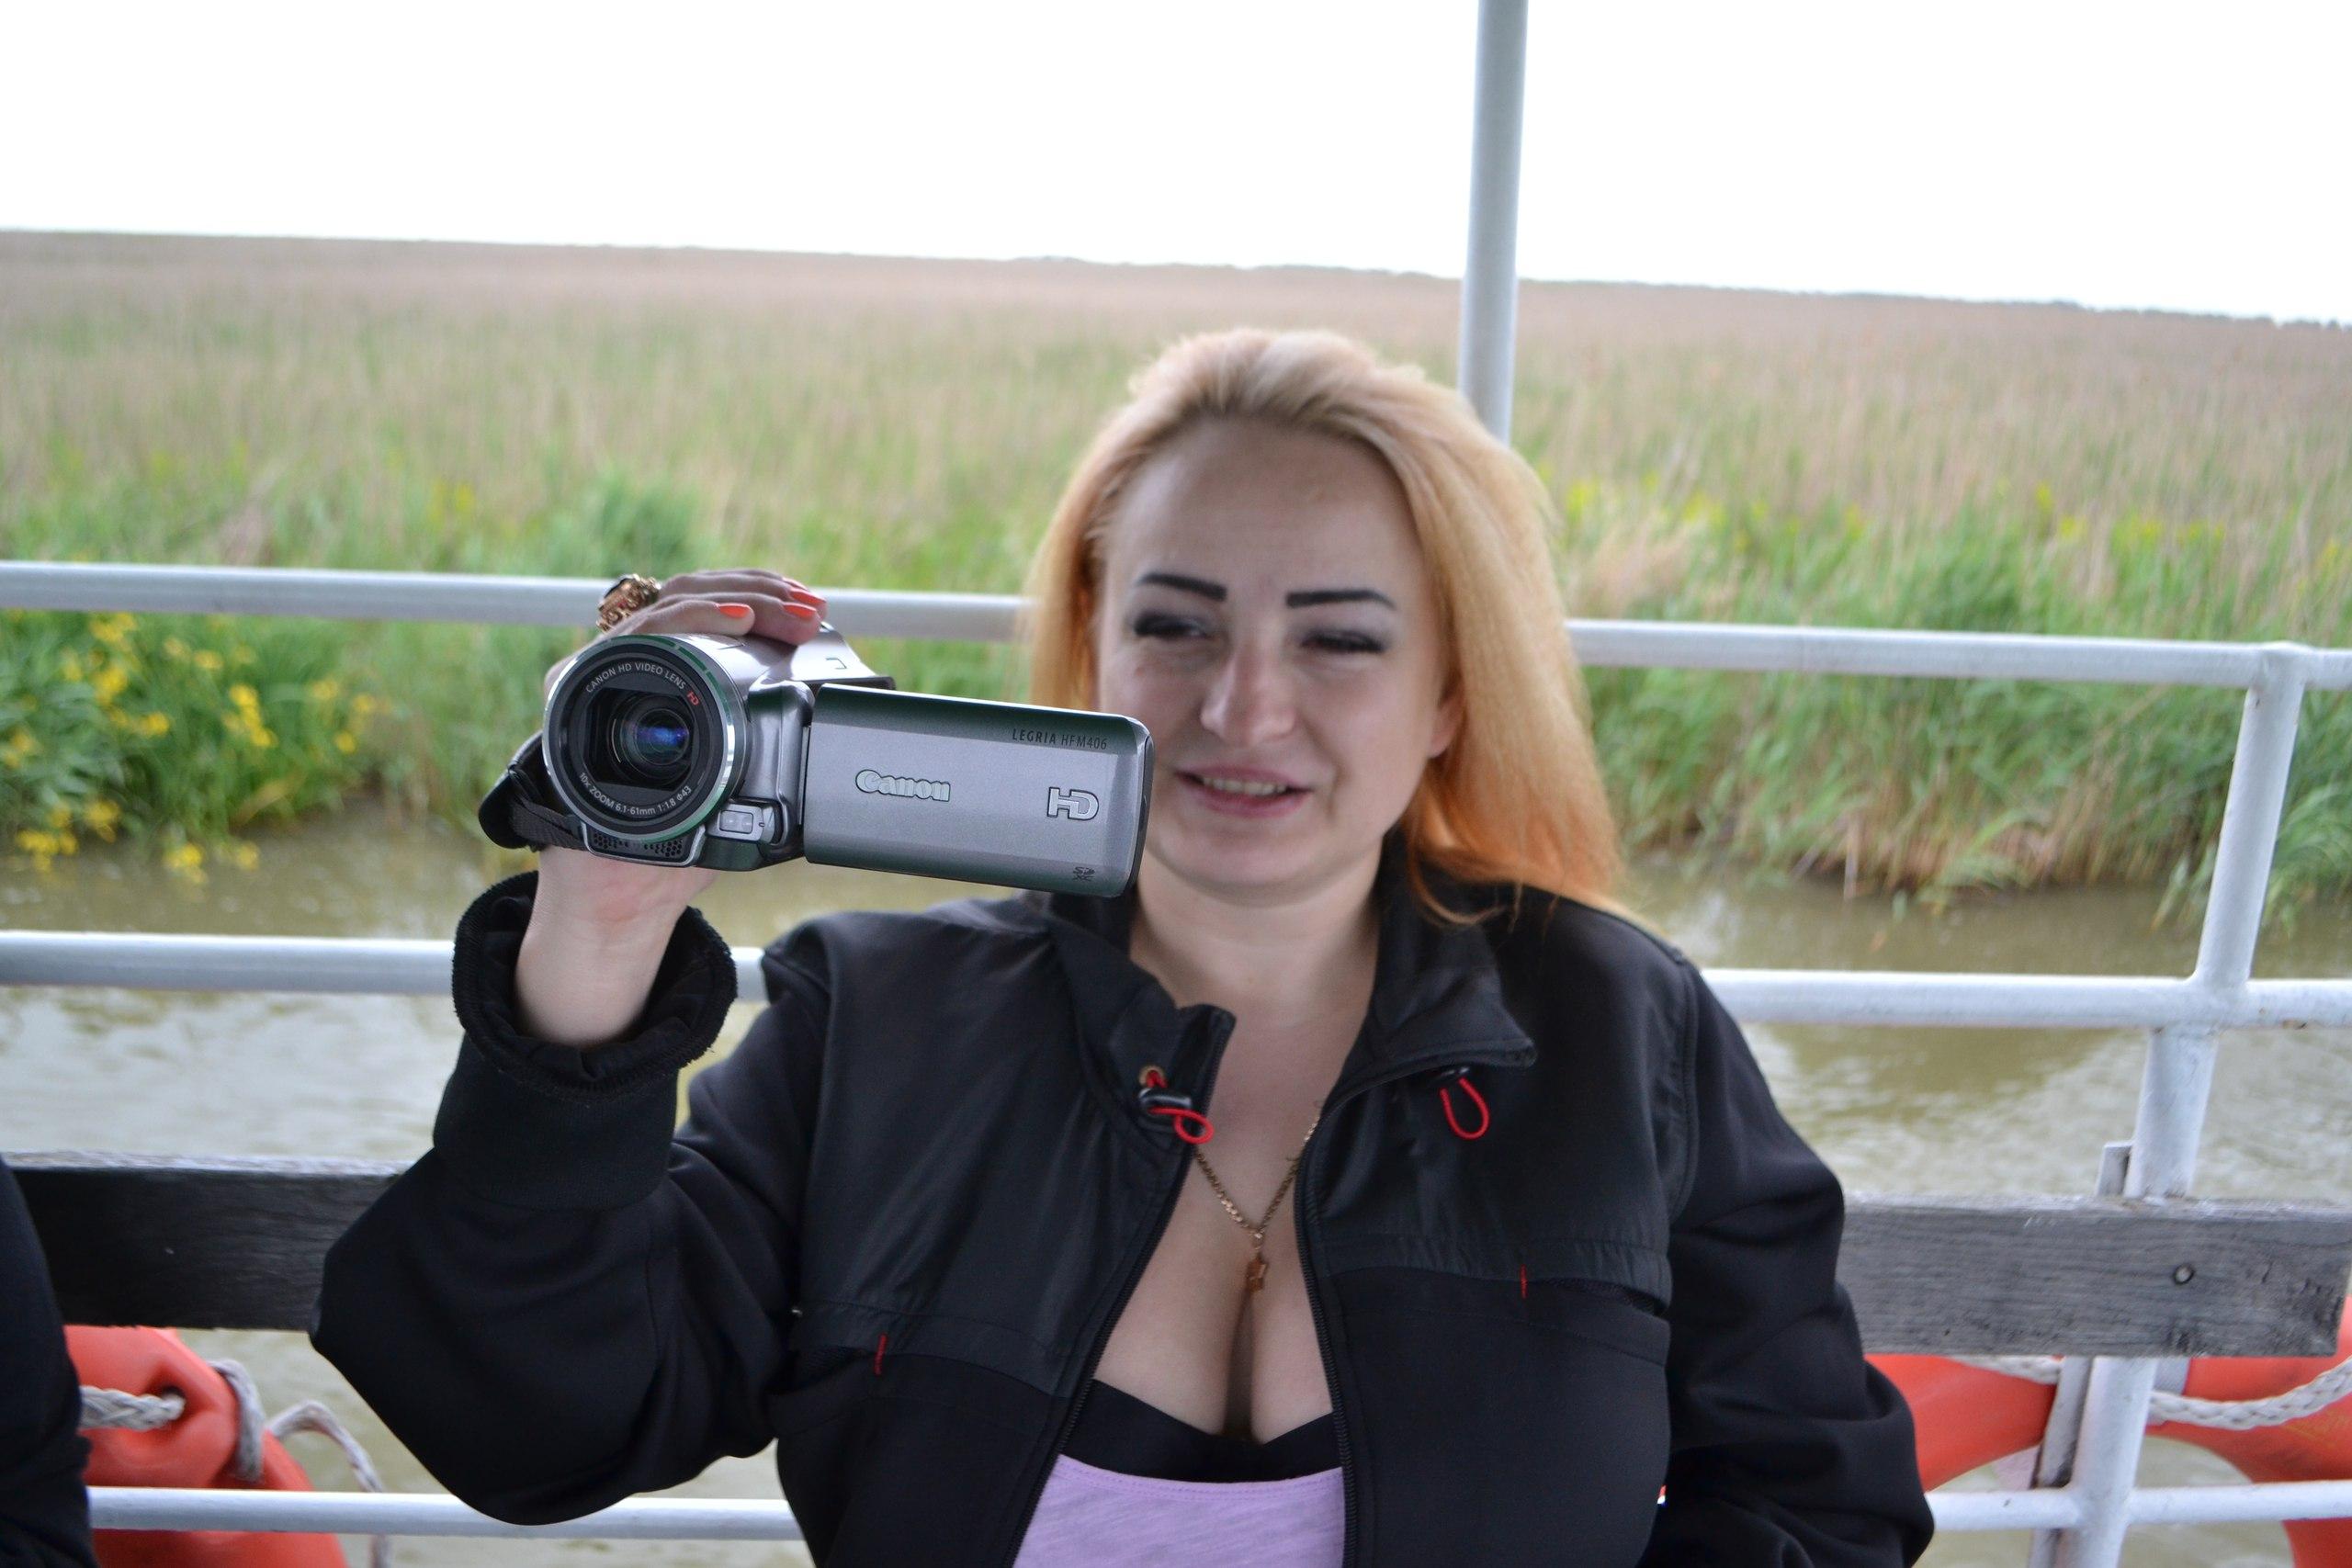 пляж - Елена Руденко. Мои путешествия (фото/видео) - Страница 3 C8xnl3RbMCE